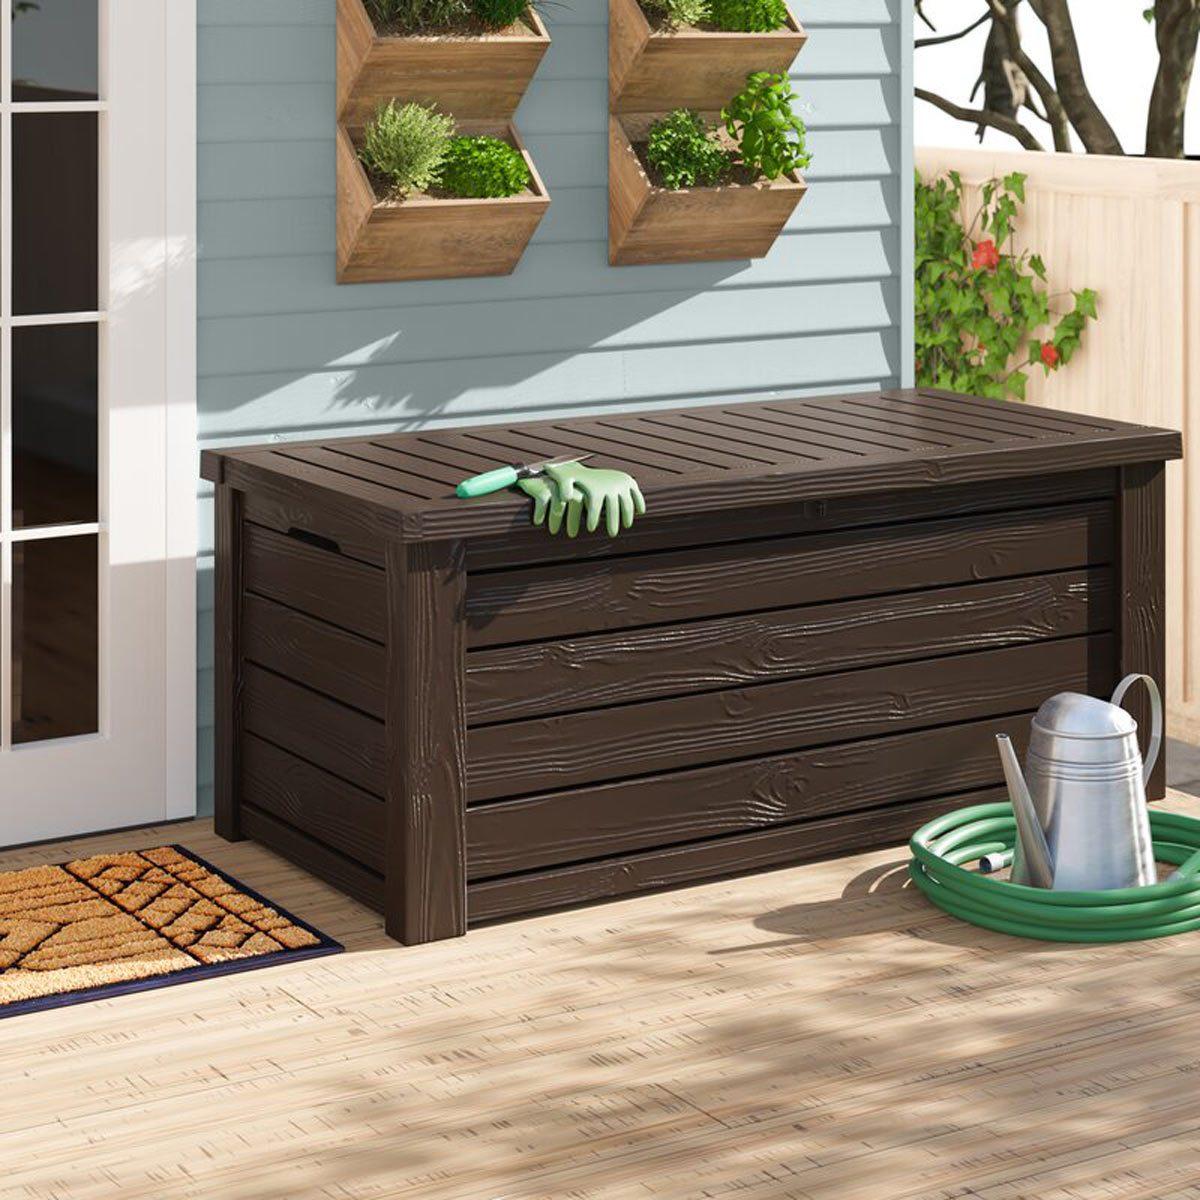 150 Gallon Resin Deck Box